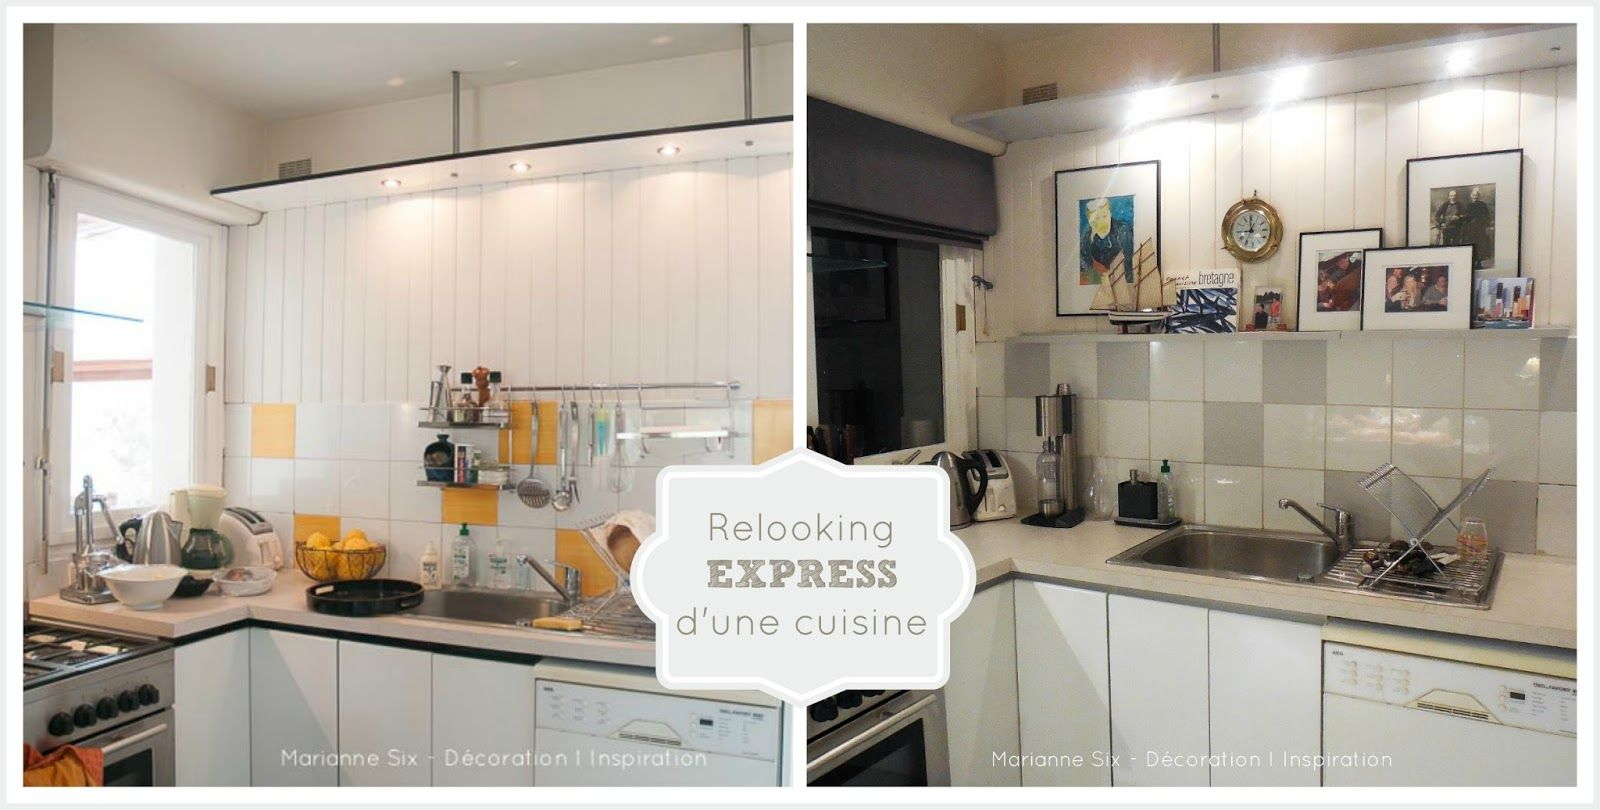 Relooking express d 39 une cuisine peinture v33 mom 39 s kitchen mini ma - Peinture v33 relooking ...